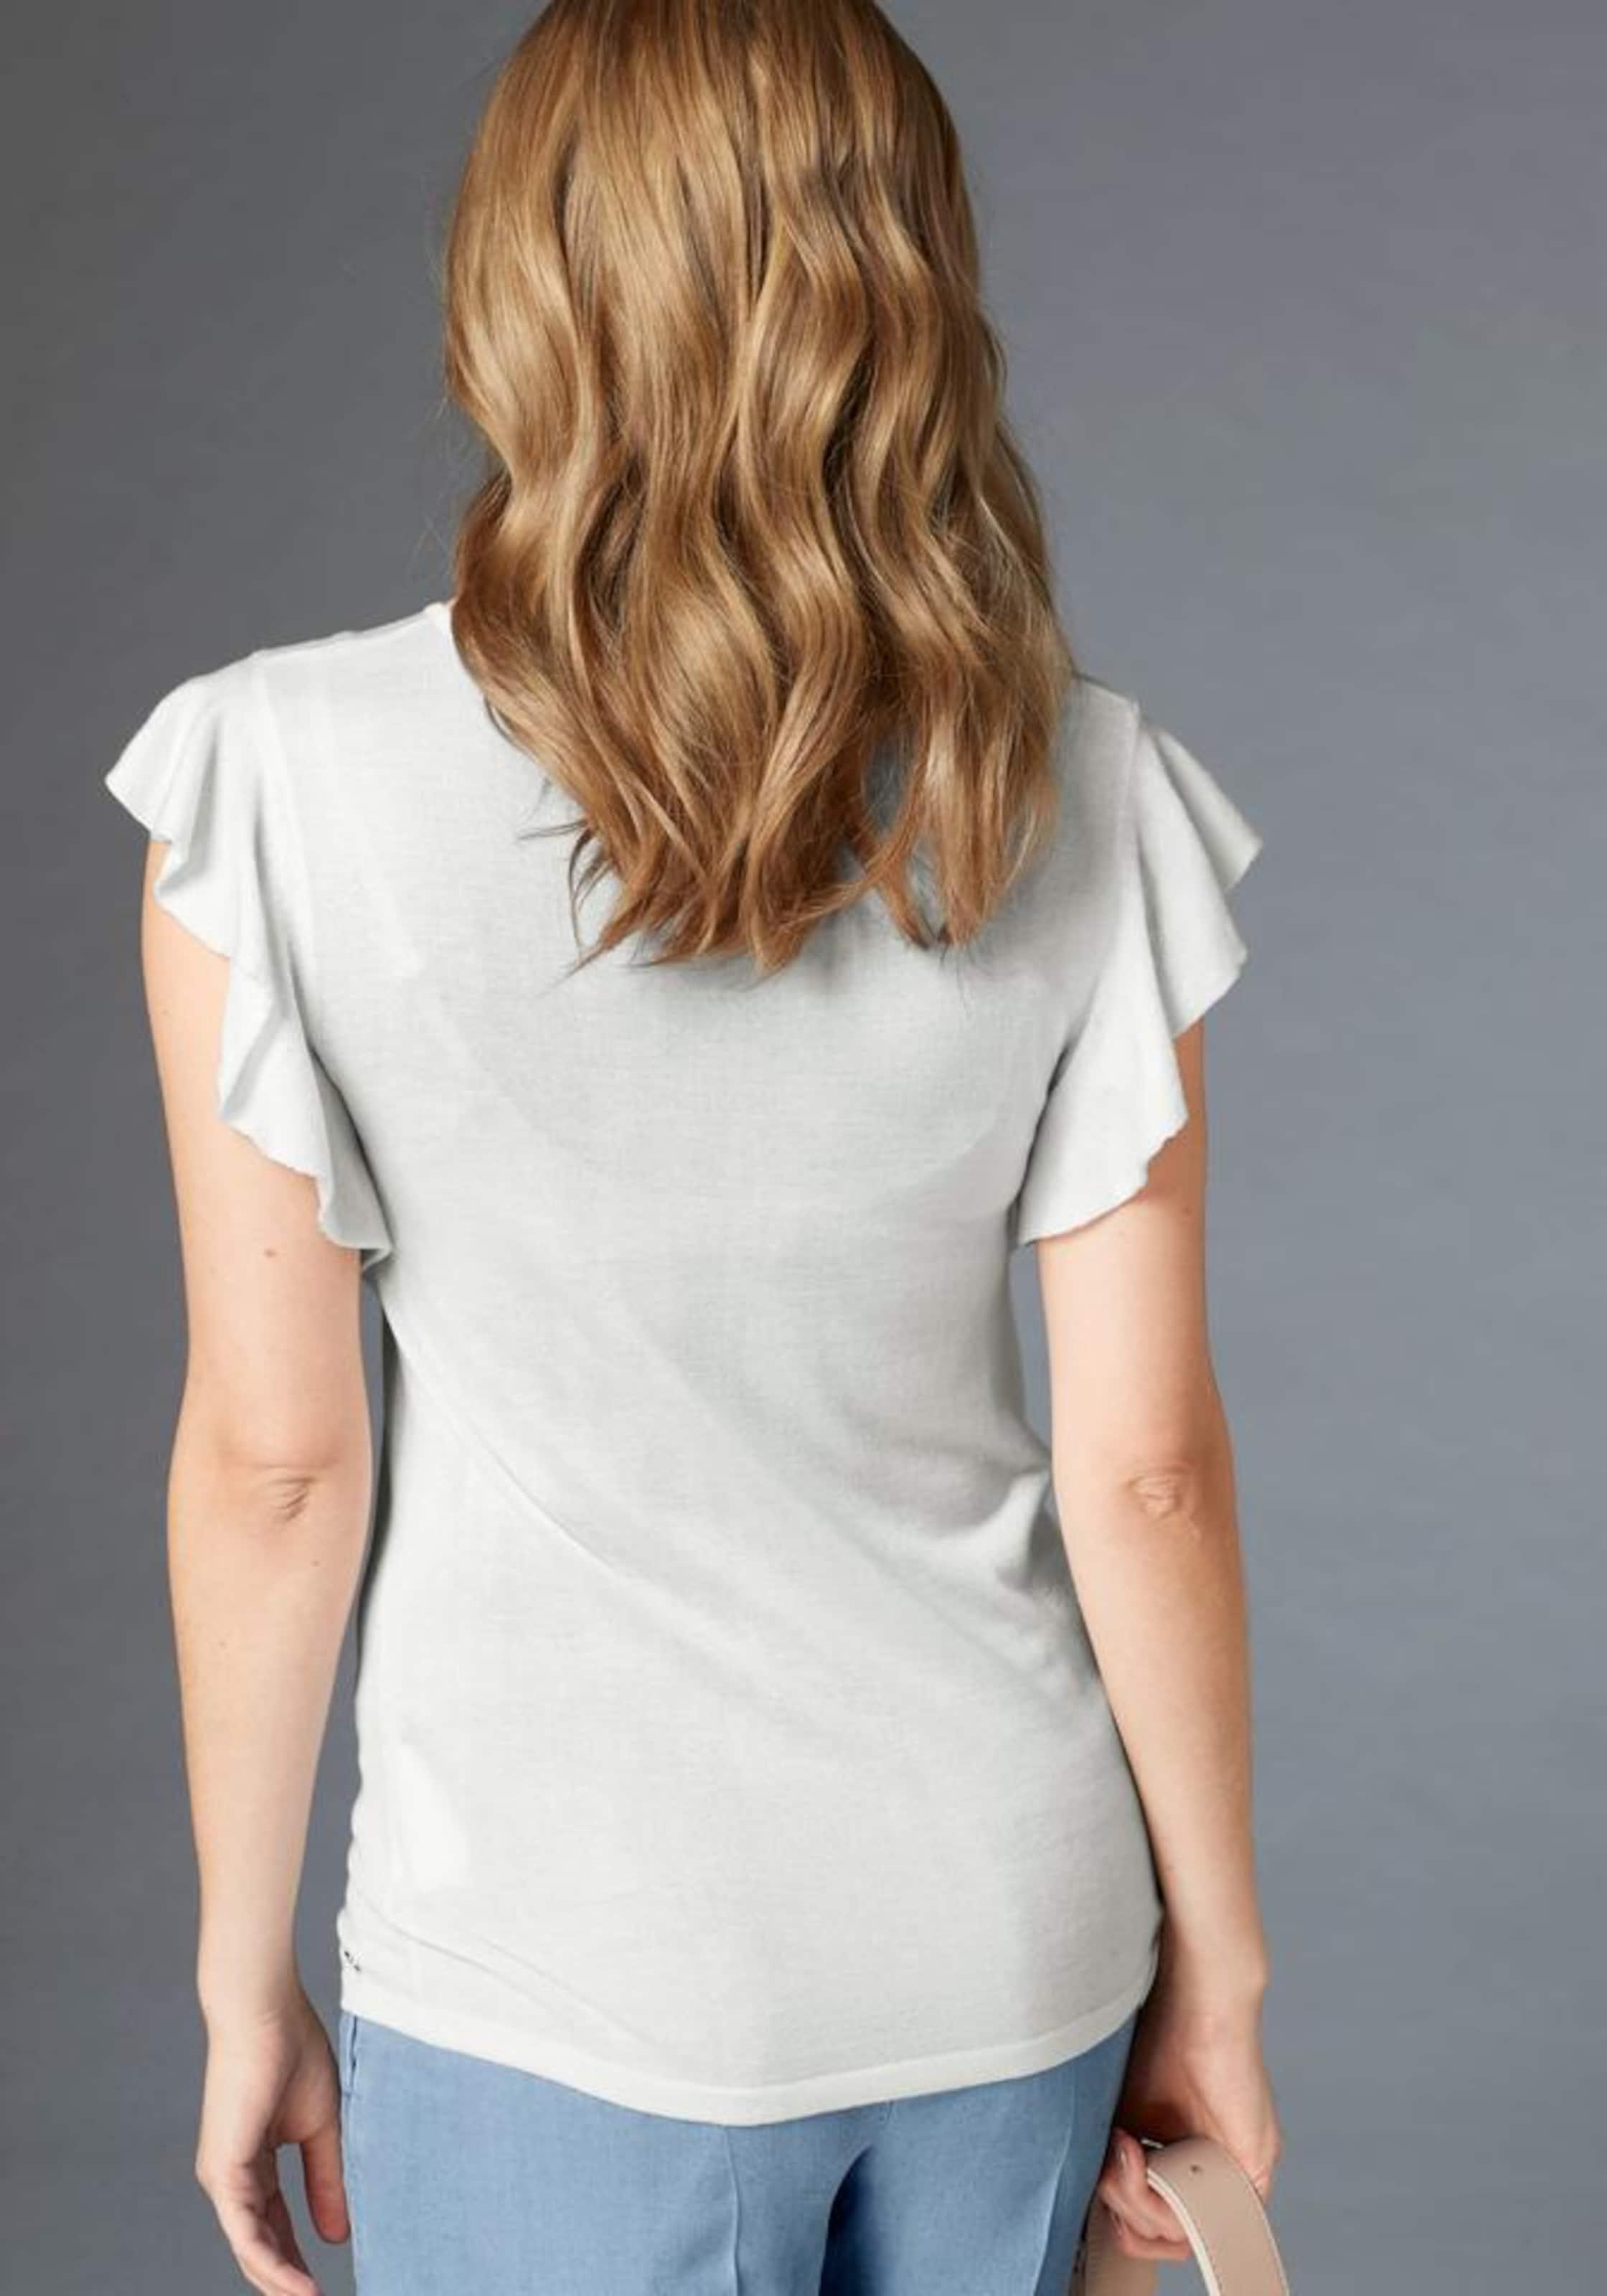 Günstig Online Guido Maria Kretschmer Kurzarmpullover Billig Verkauf Bester Verkauf Auslass Echt Erstaunlicher Preis Günstiger Preis Mode-Stil Online brgPvWHY